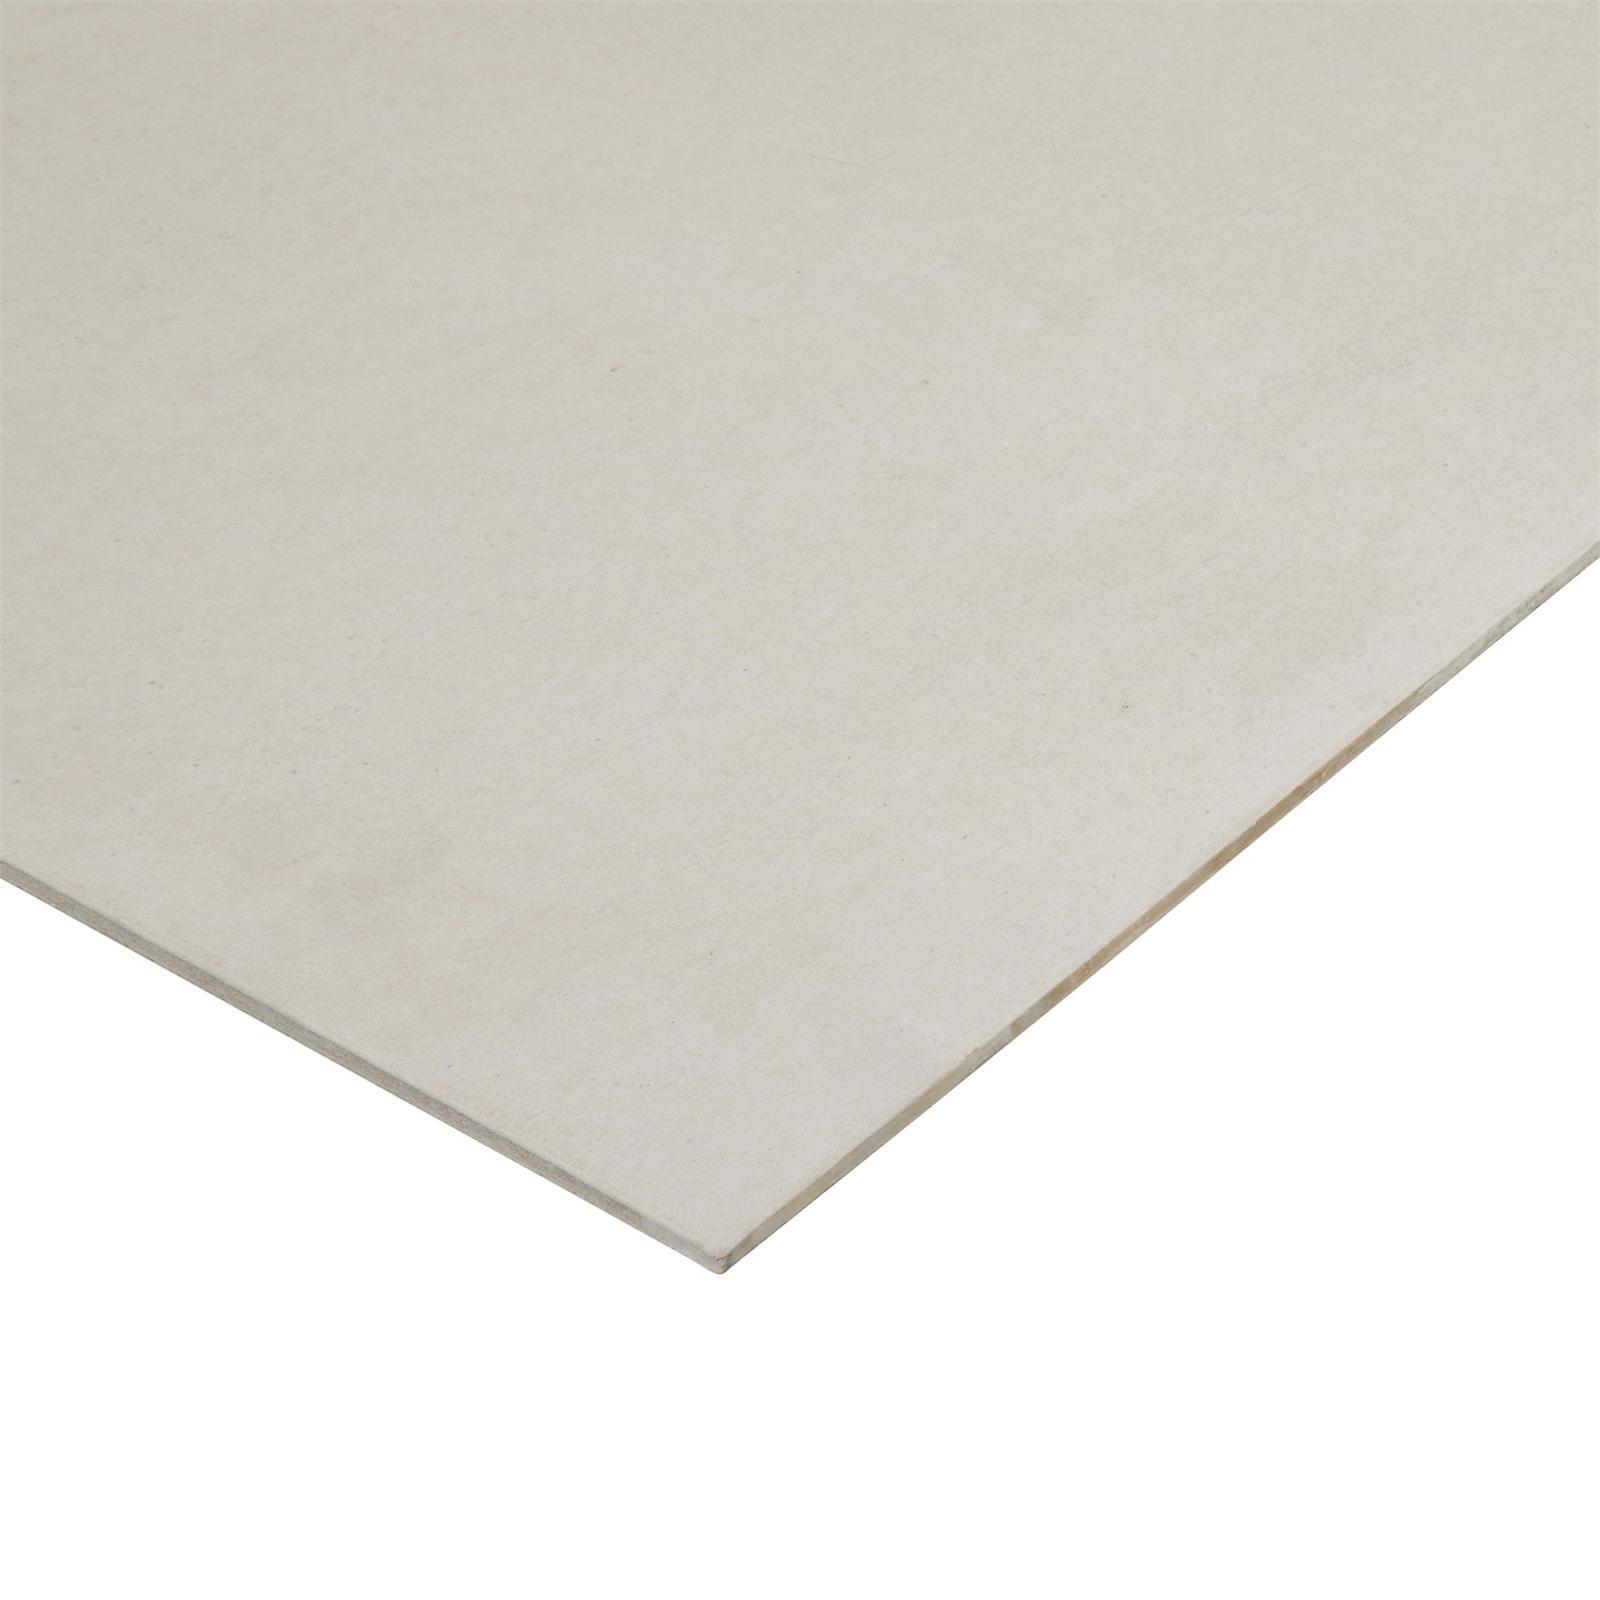 BGC Durasheet 2400x 750x4.5mm Fibre Cement Sheet 1.80sqm